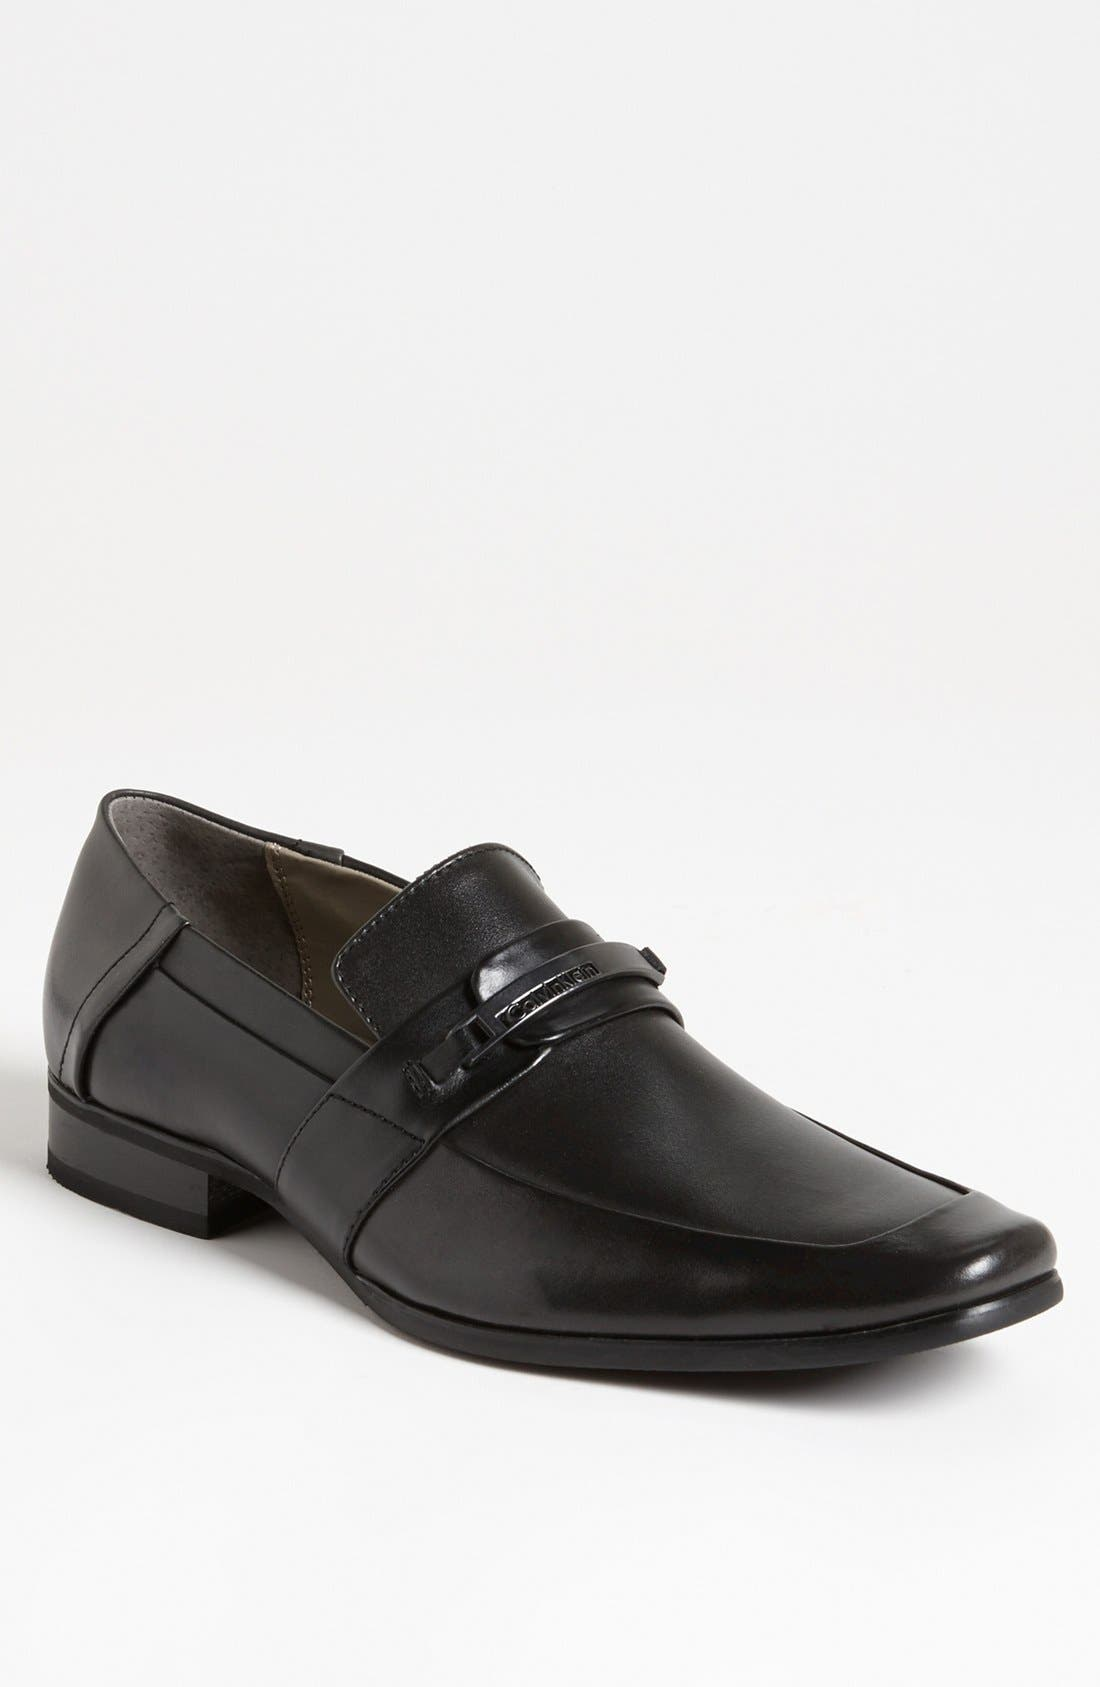 Alternate Image 1 Selected - Calvin Klein 'Brice' Bit Loafer